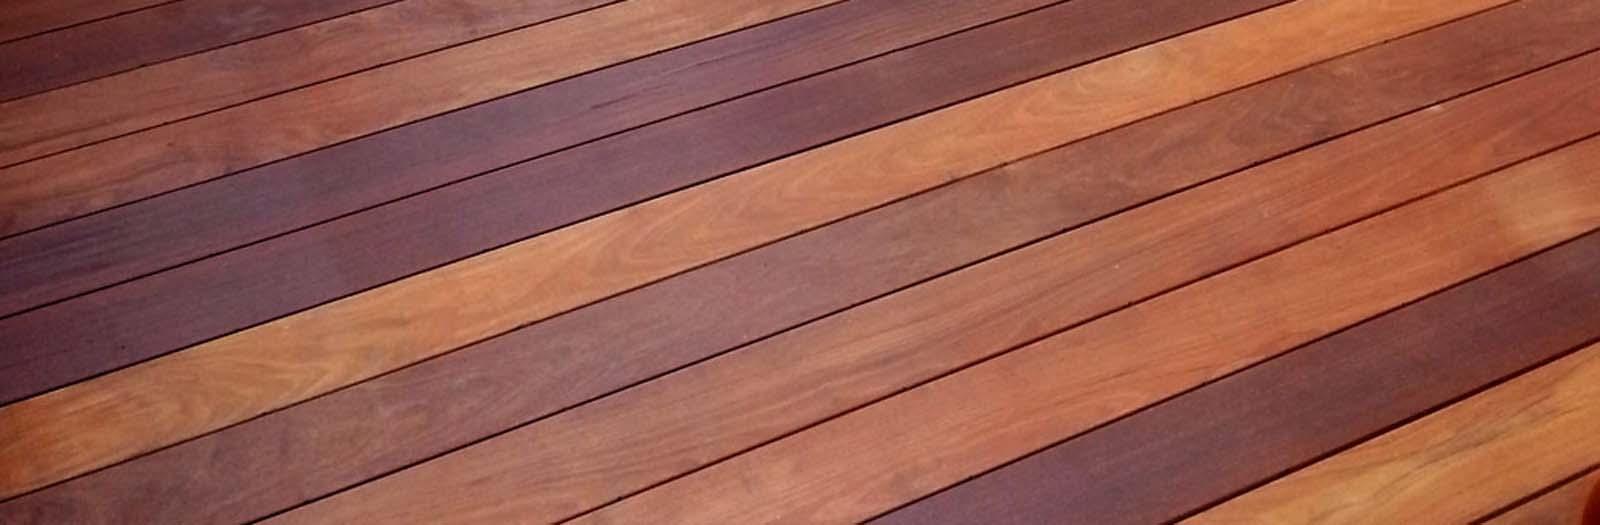 brazilian hardwood decking | interior trim u0026 supply QEVOYVS